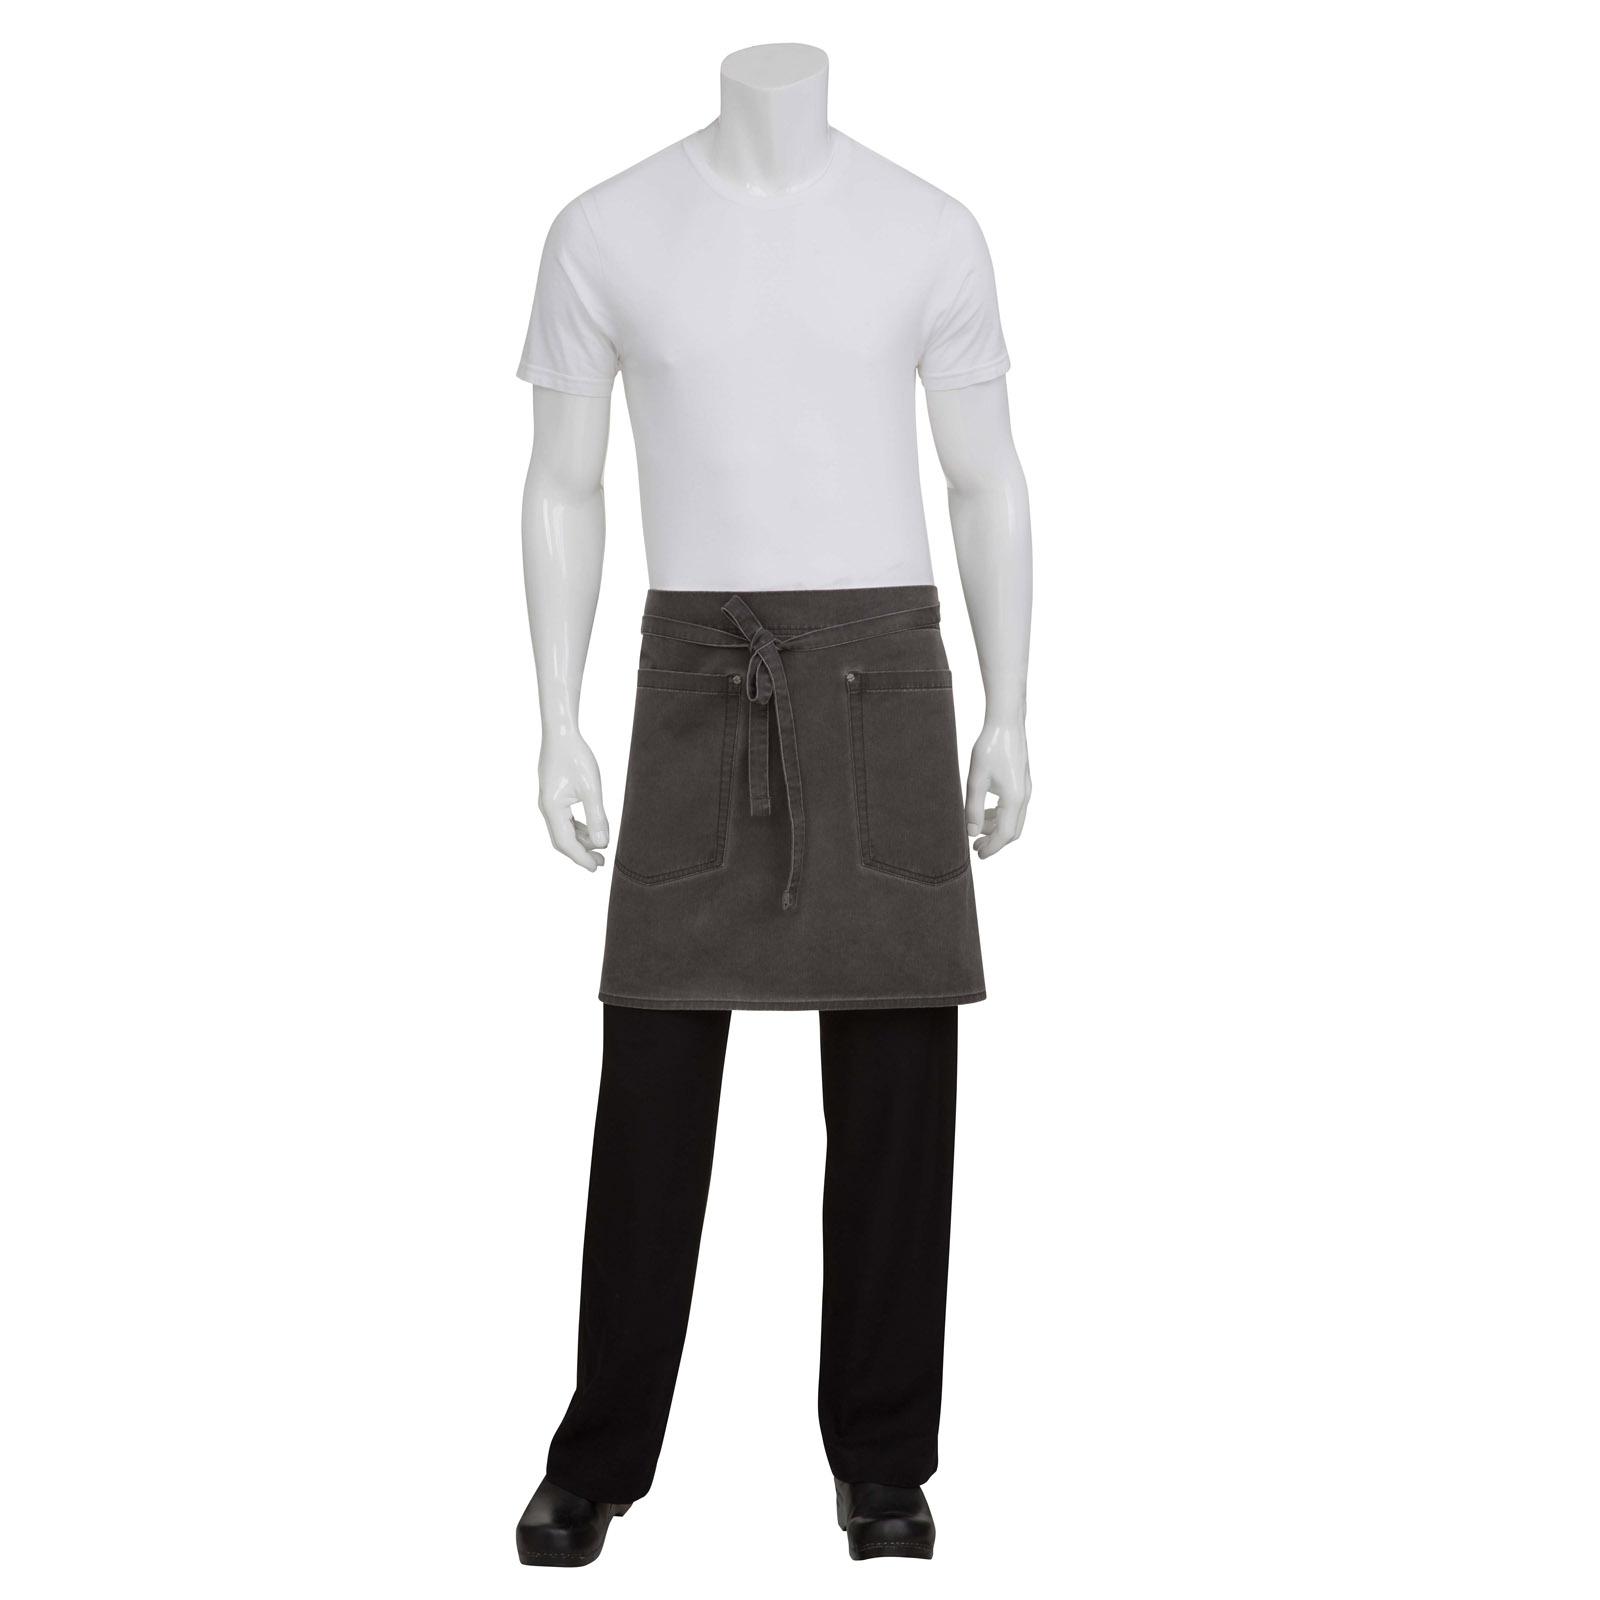 Chef Works AHWAQ014PEW0 waist apron